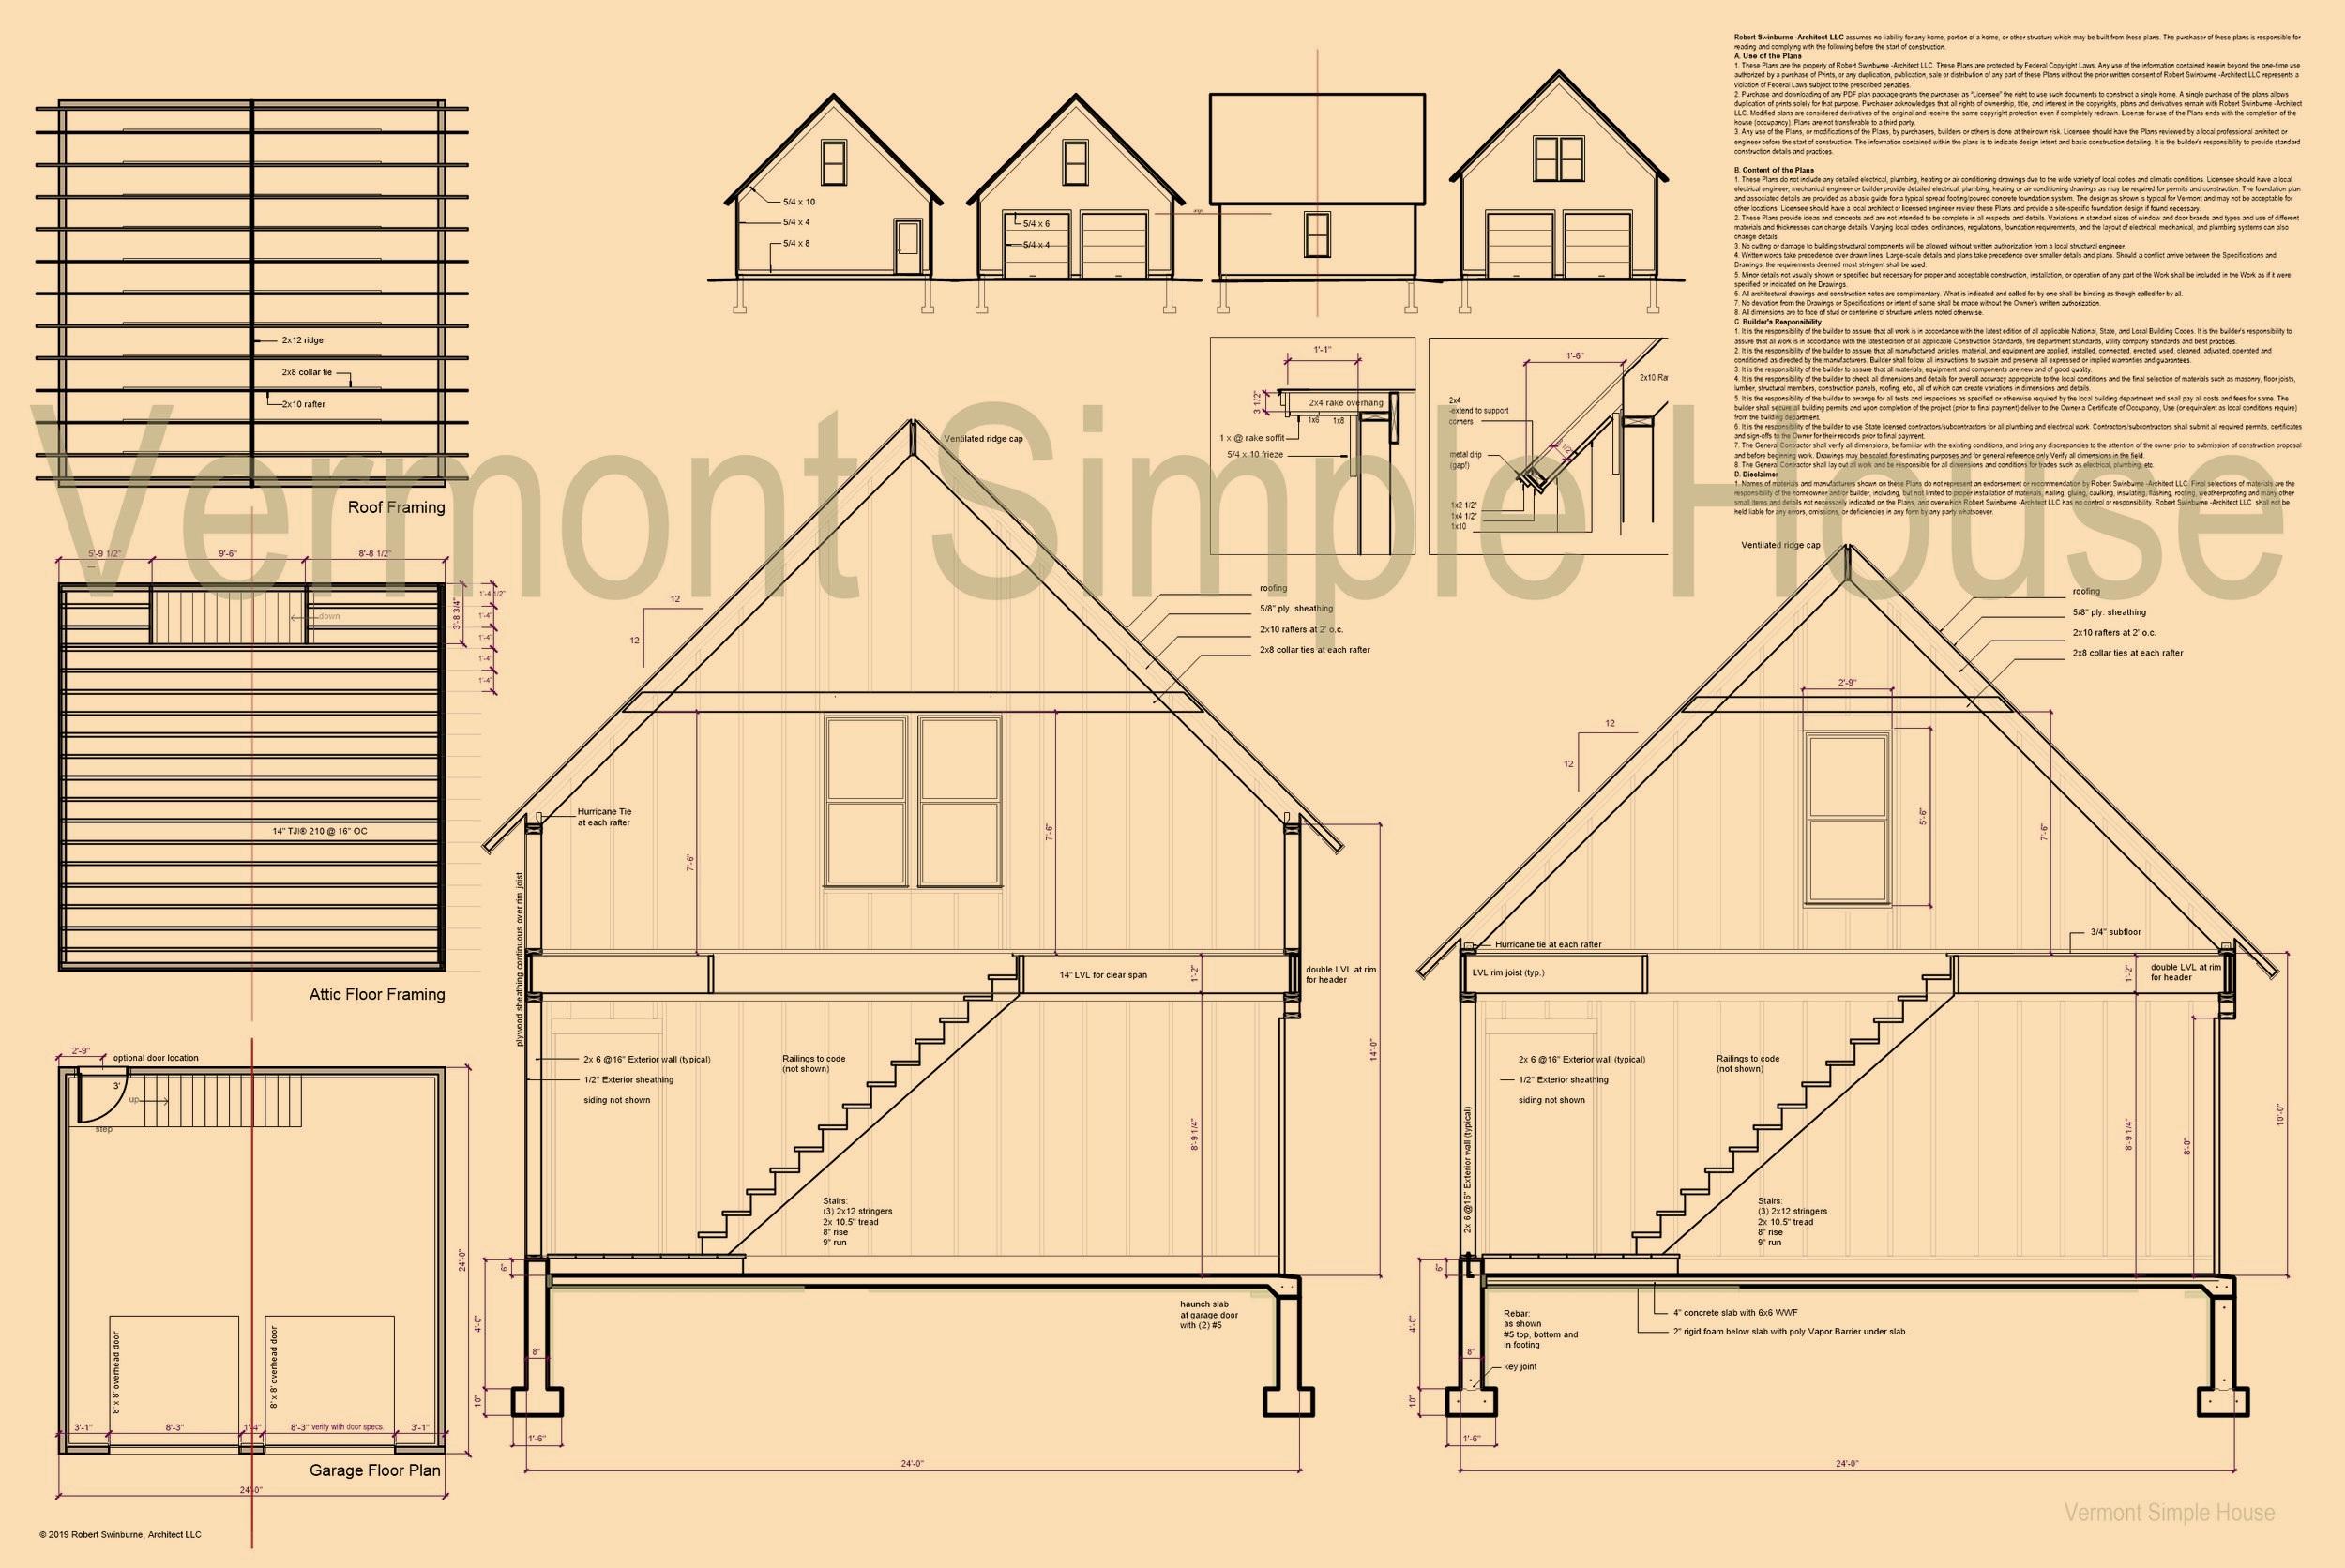 VSH-garage-small+image.jpg